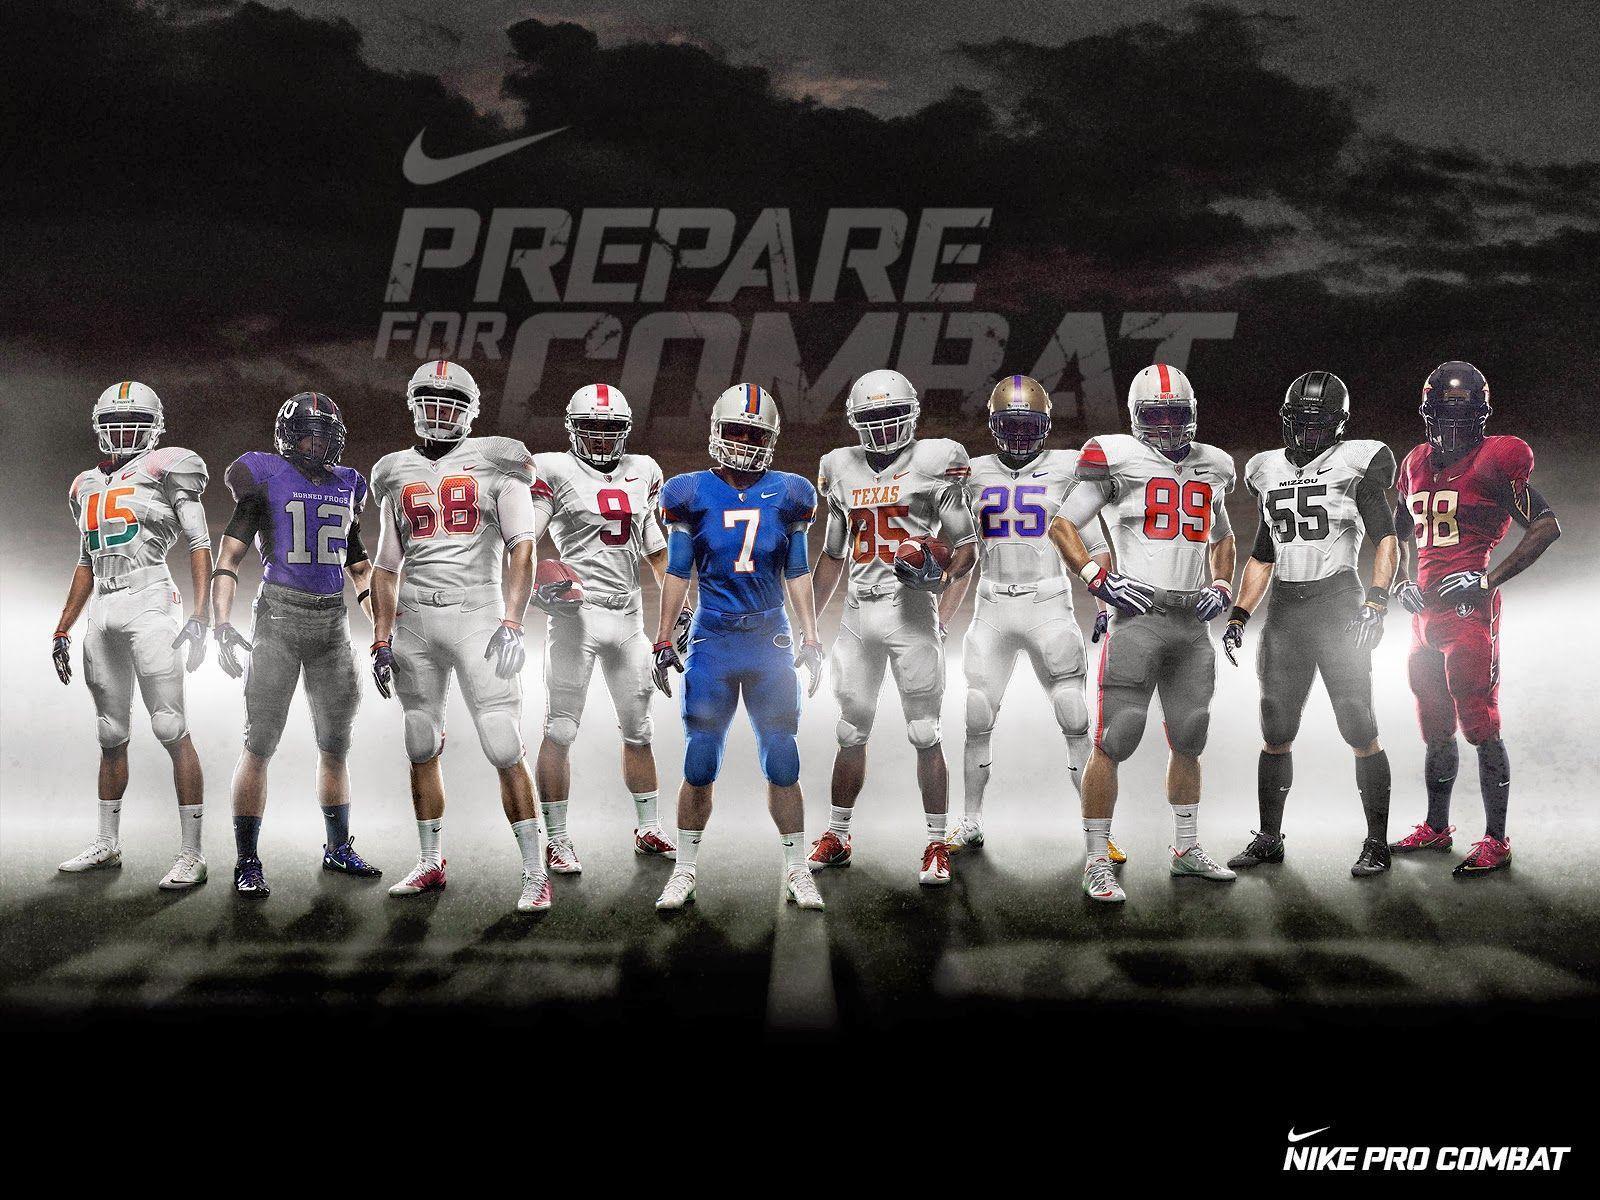 Football Wallpapers Desktop Background: College Football Wallpapers